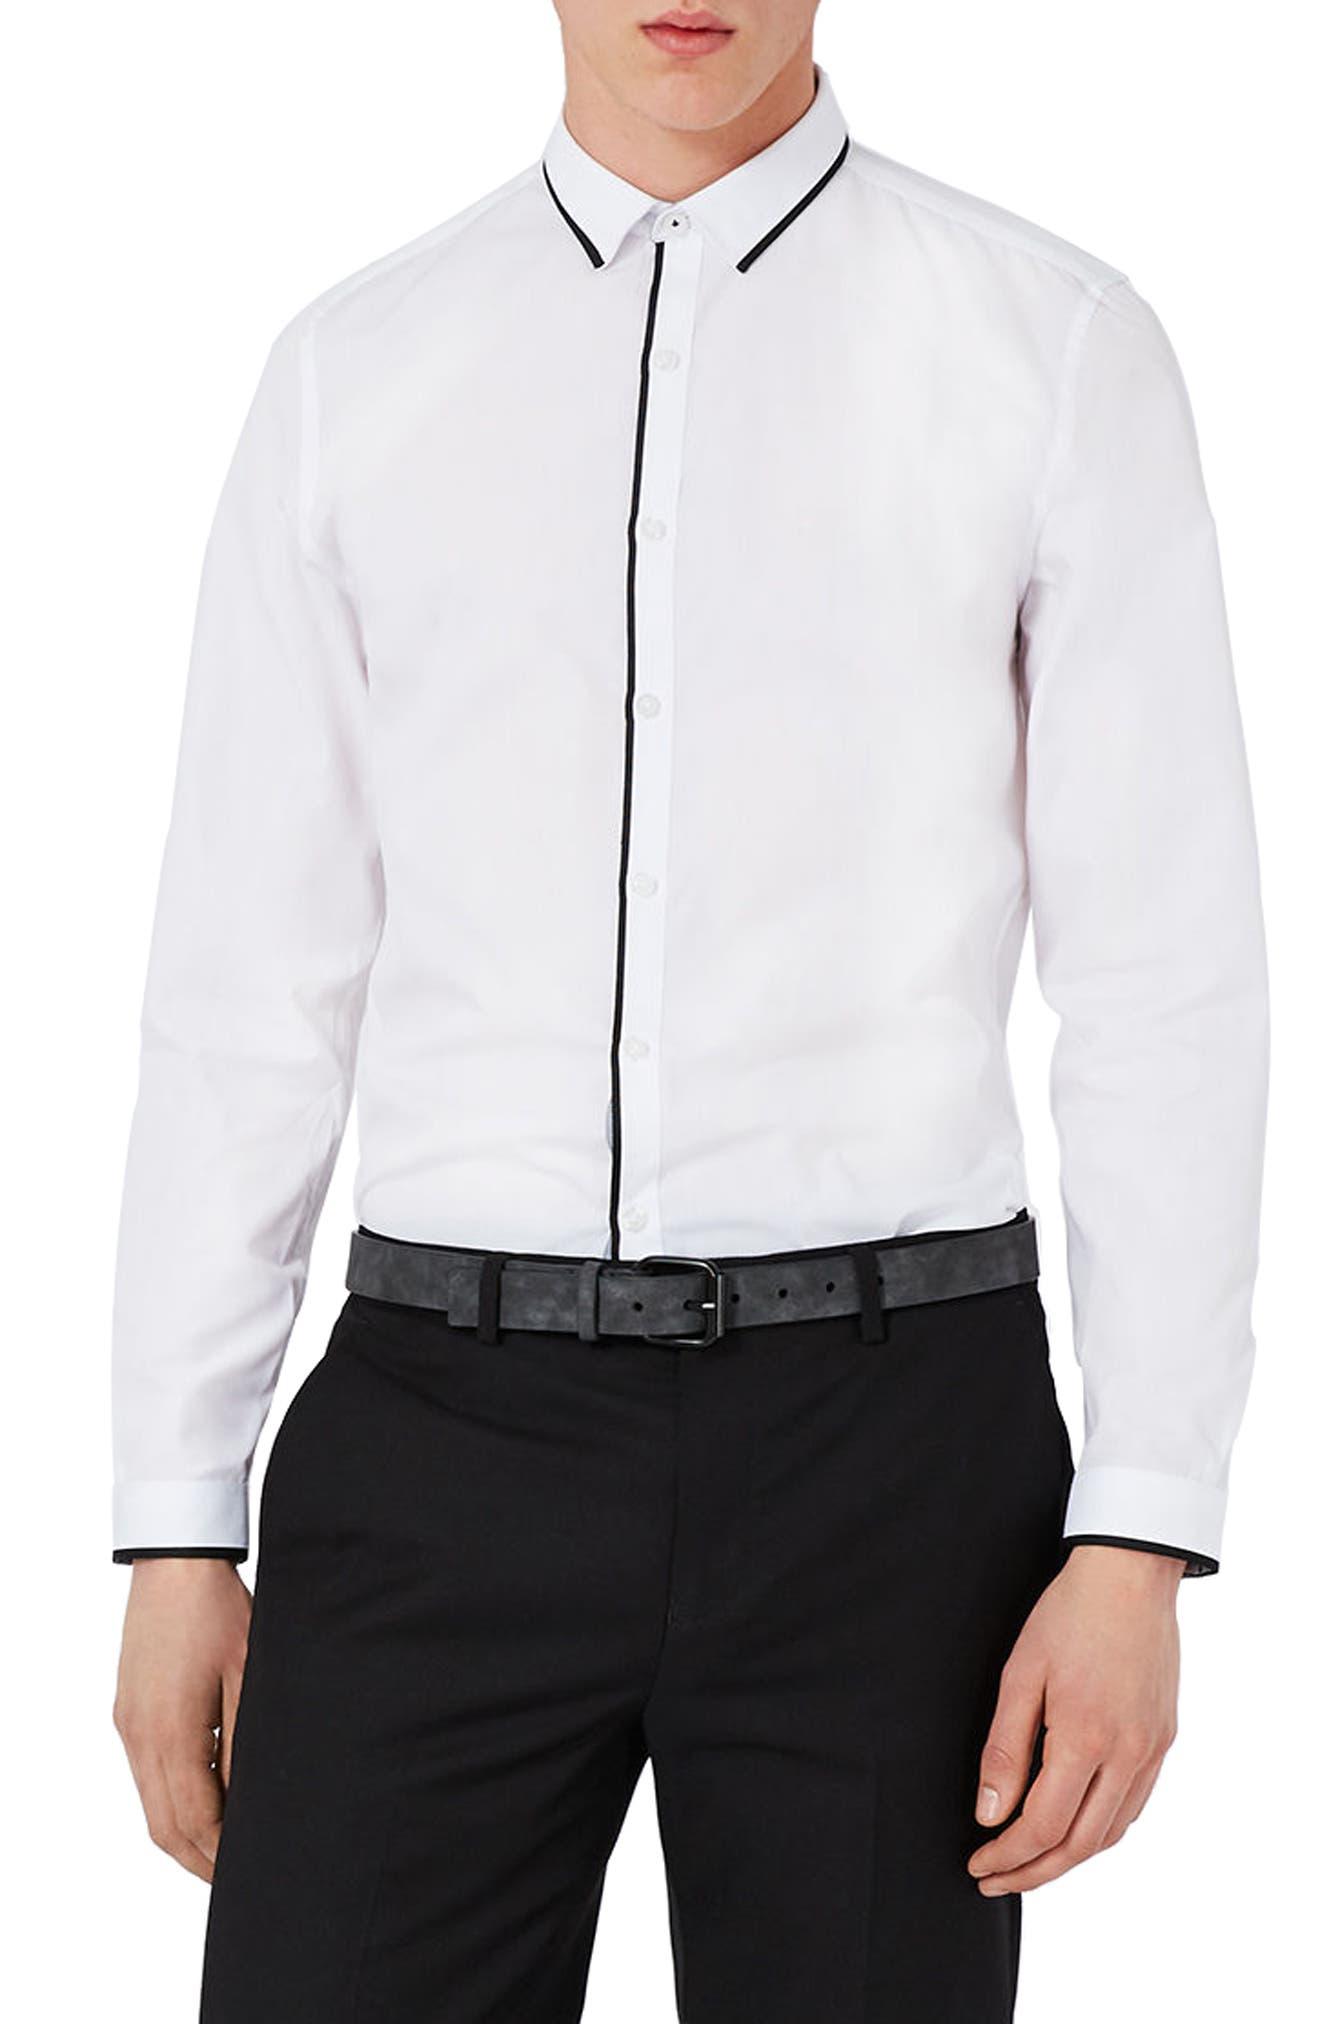 Alternate Image 2  - Topman Slim Fit Contrast Dress Shirt